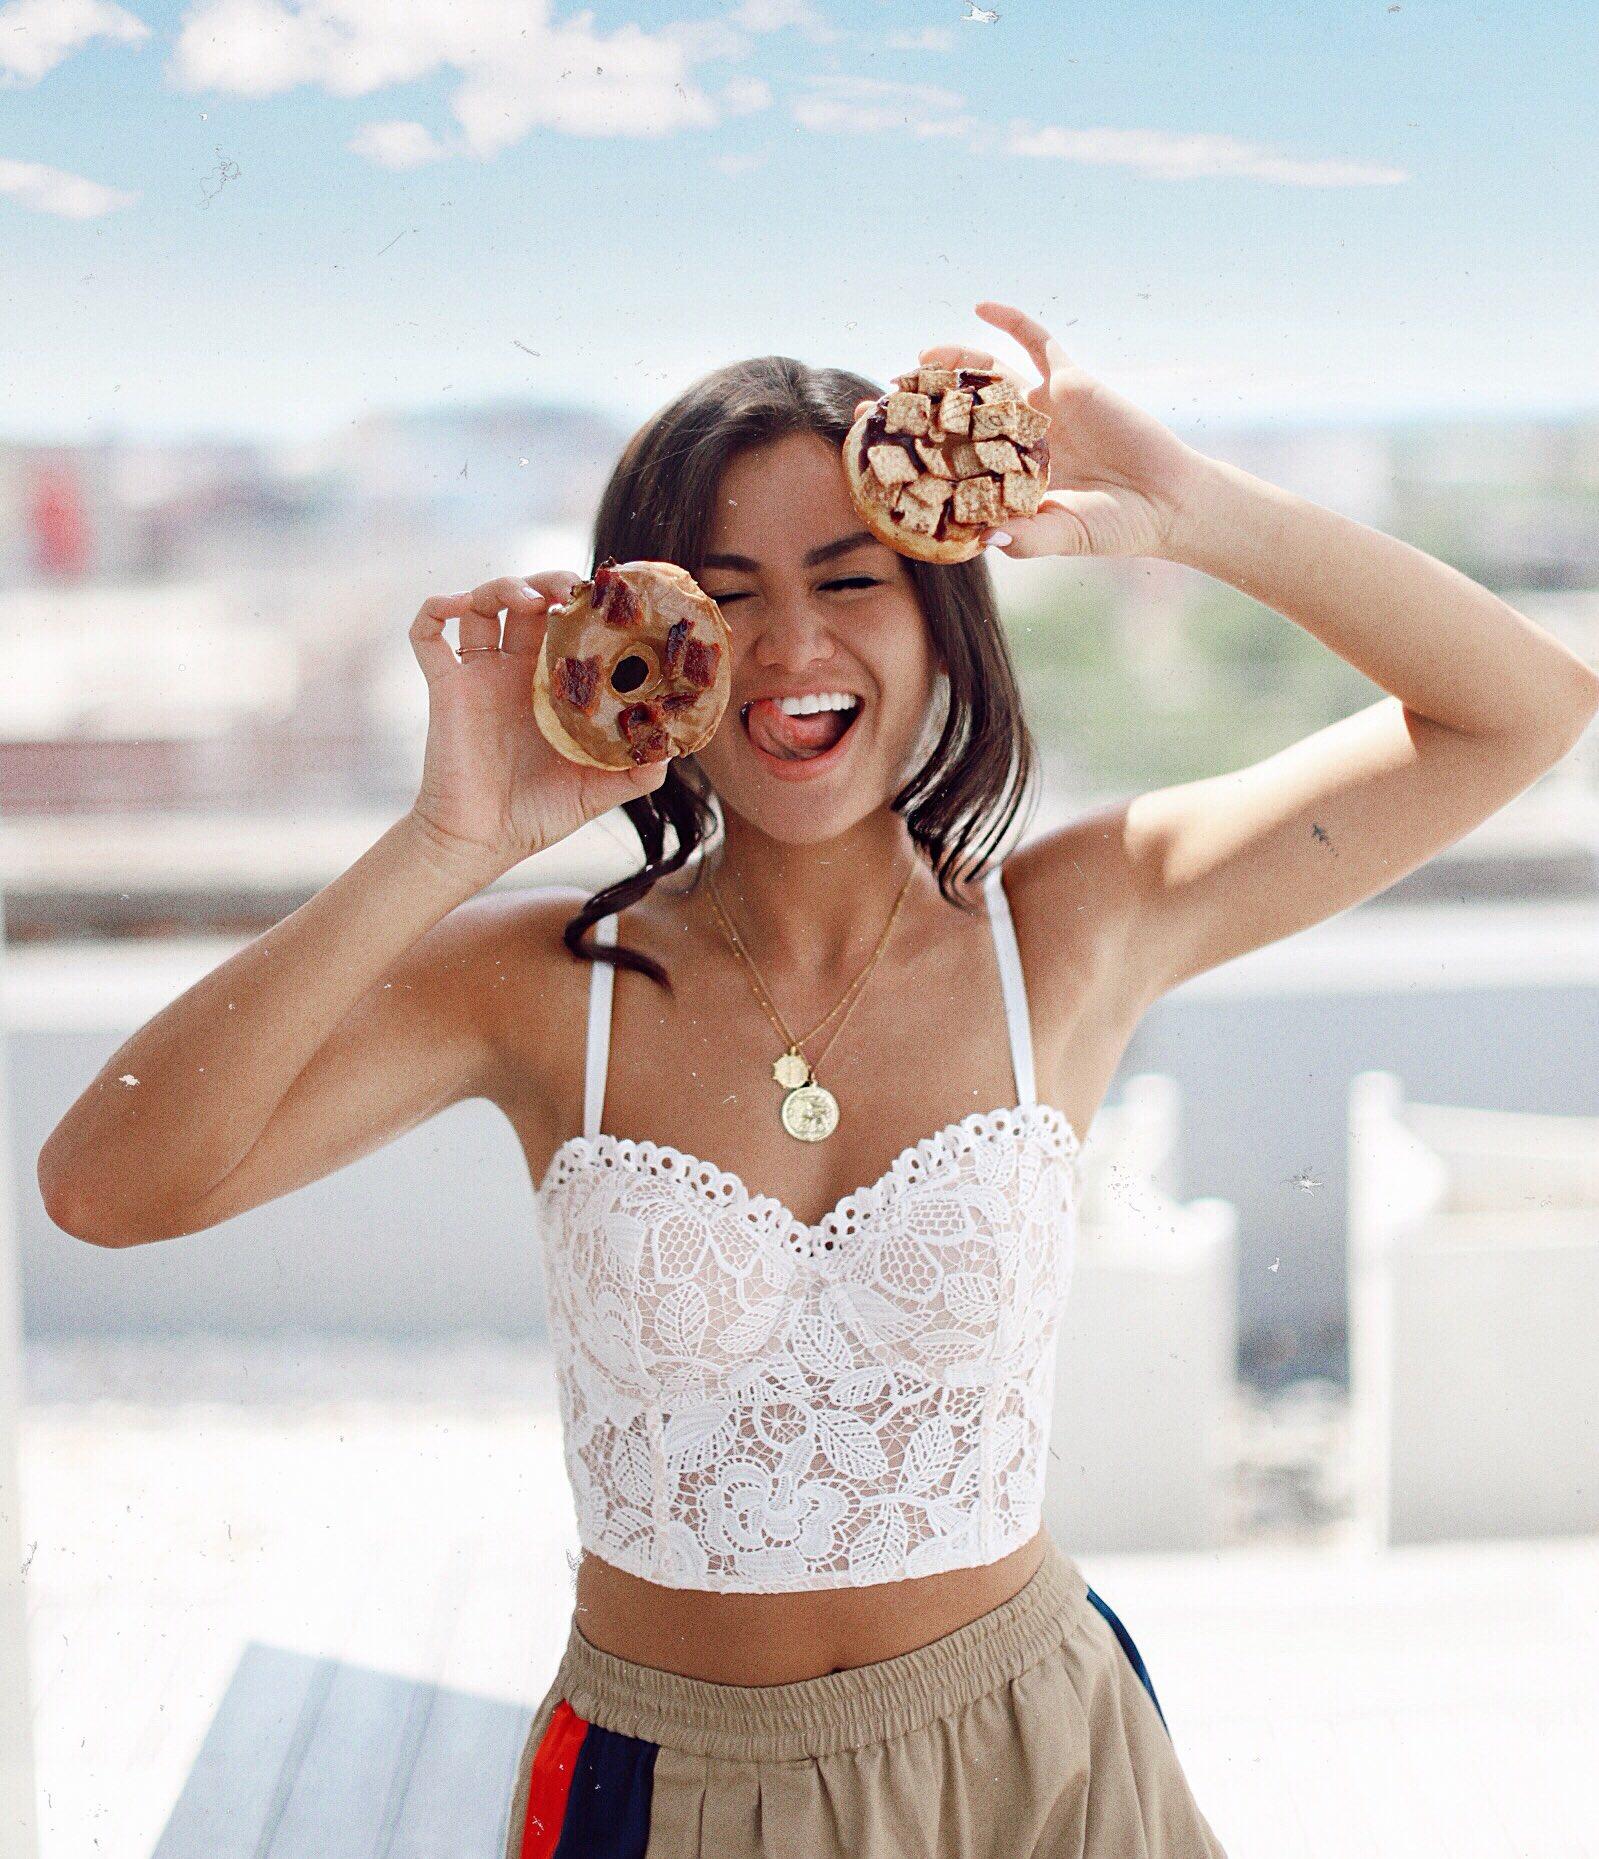 Caila Quinn The Bachelor in Richmond Virginia with Sugar Shack Donuts